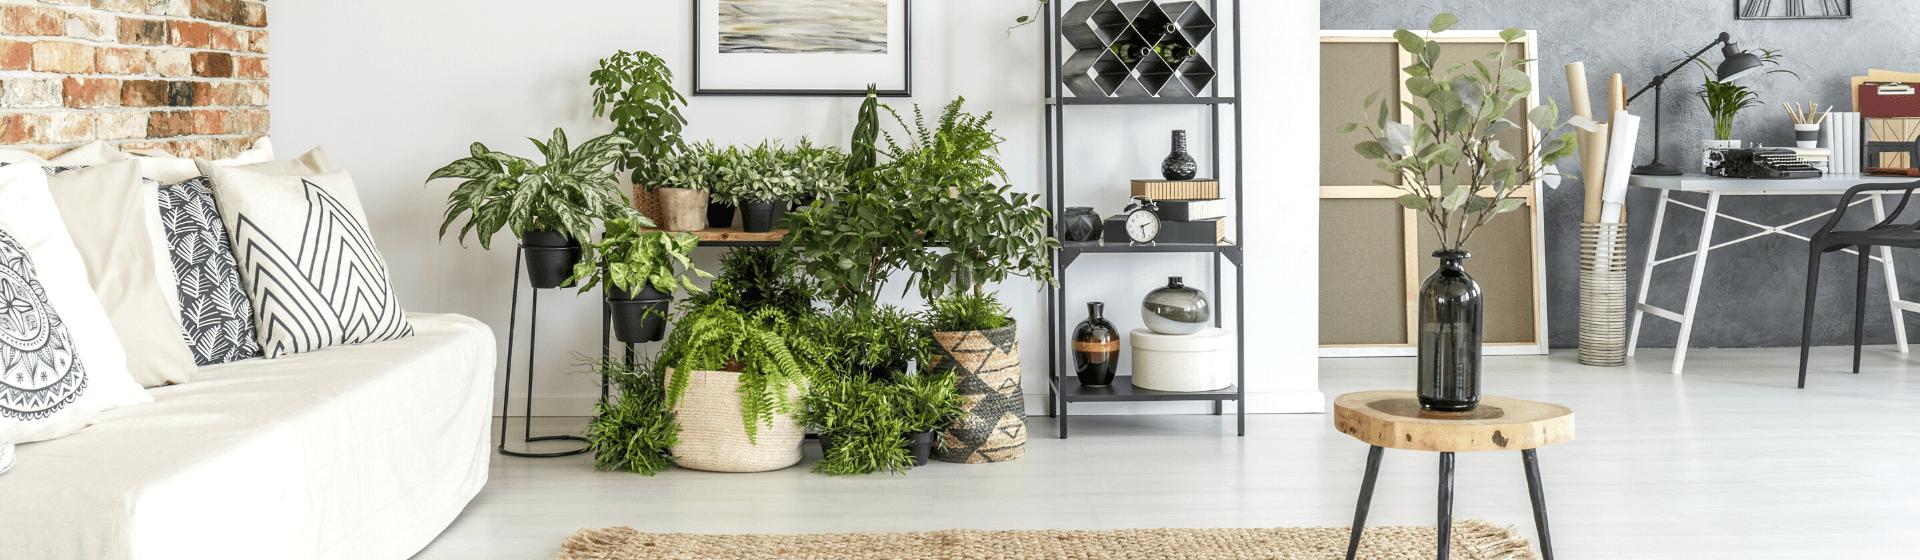 Plantas para casa: 10 espécies de plantas para cultivar dentro de casa